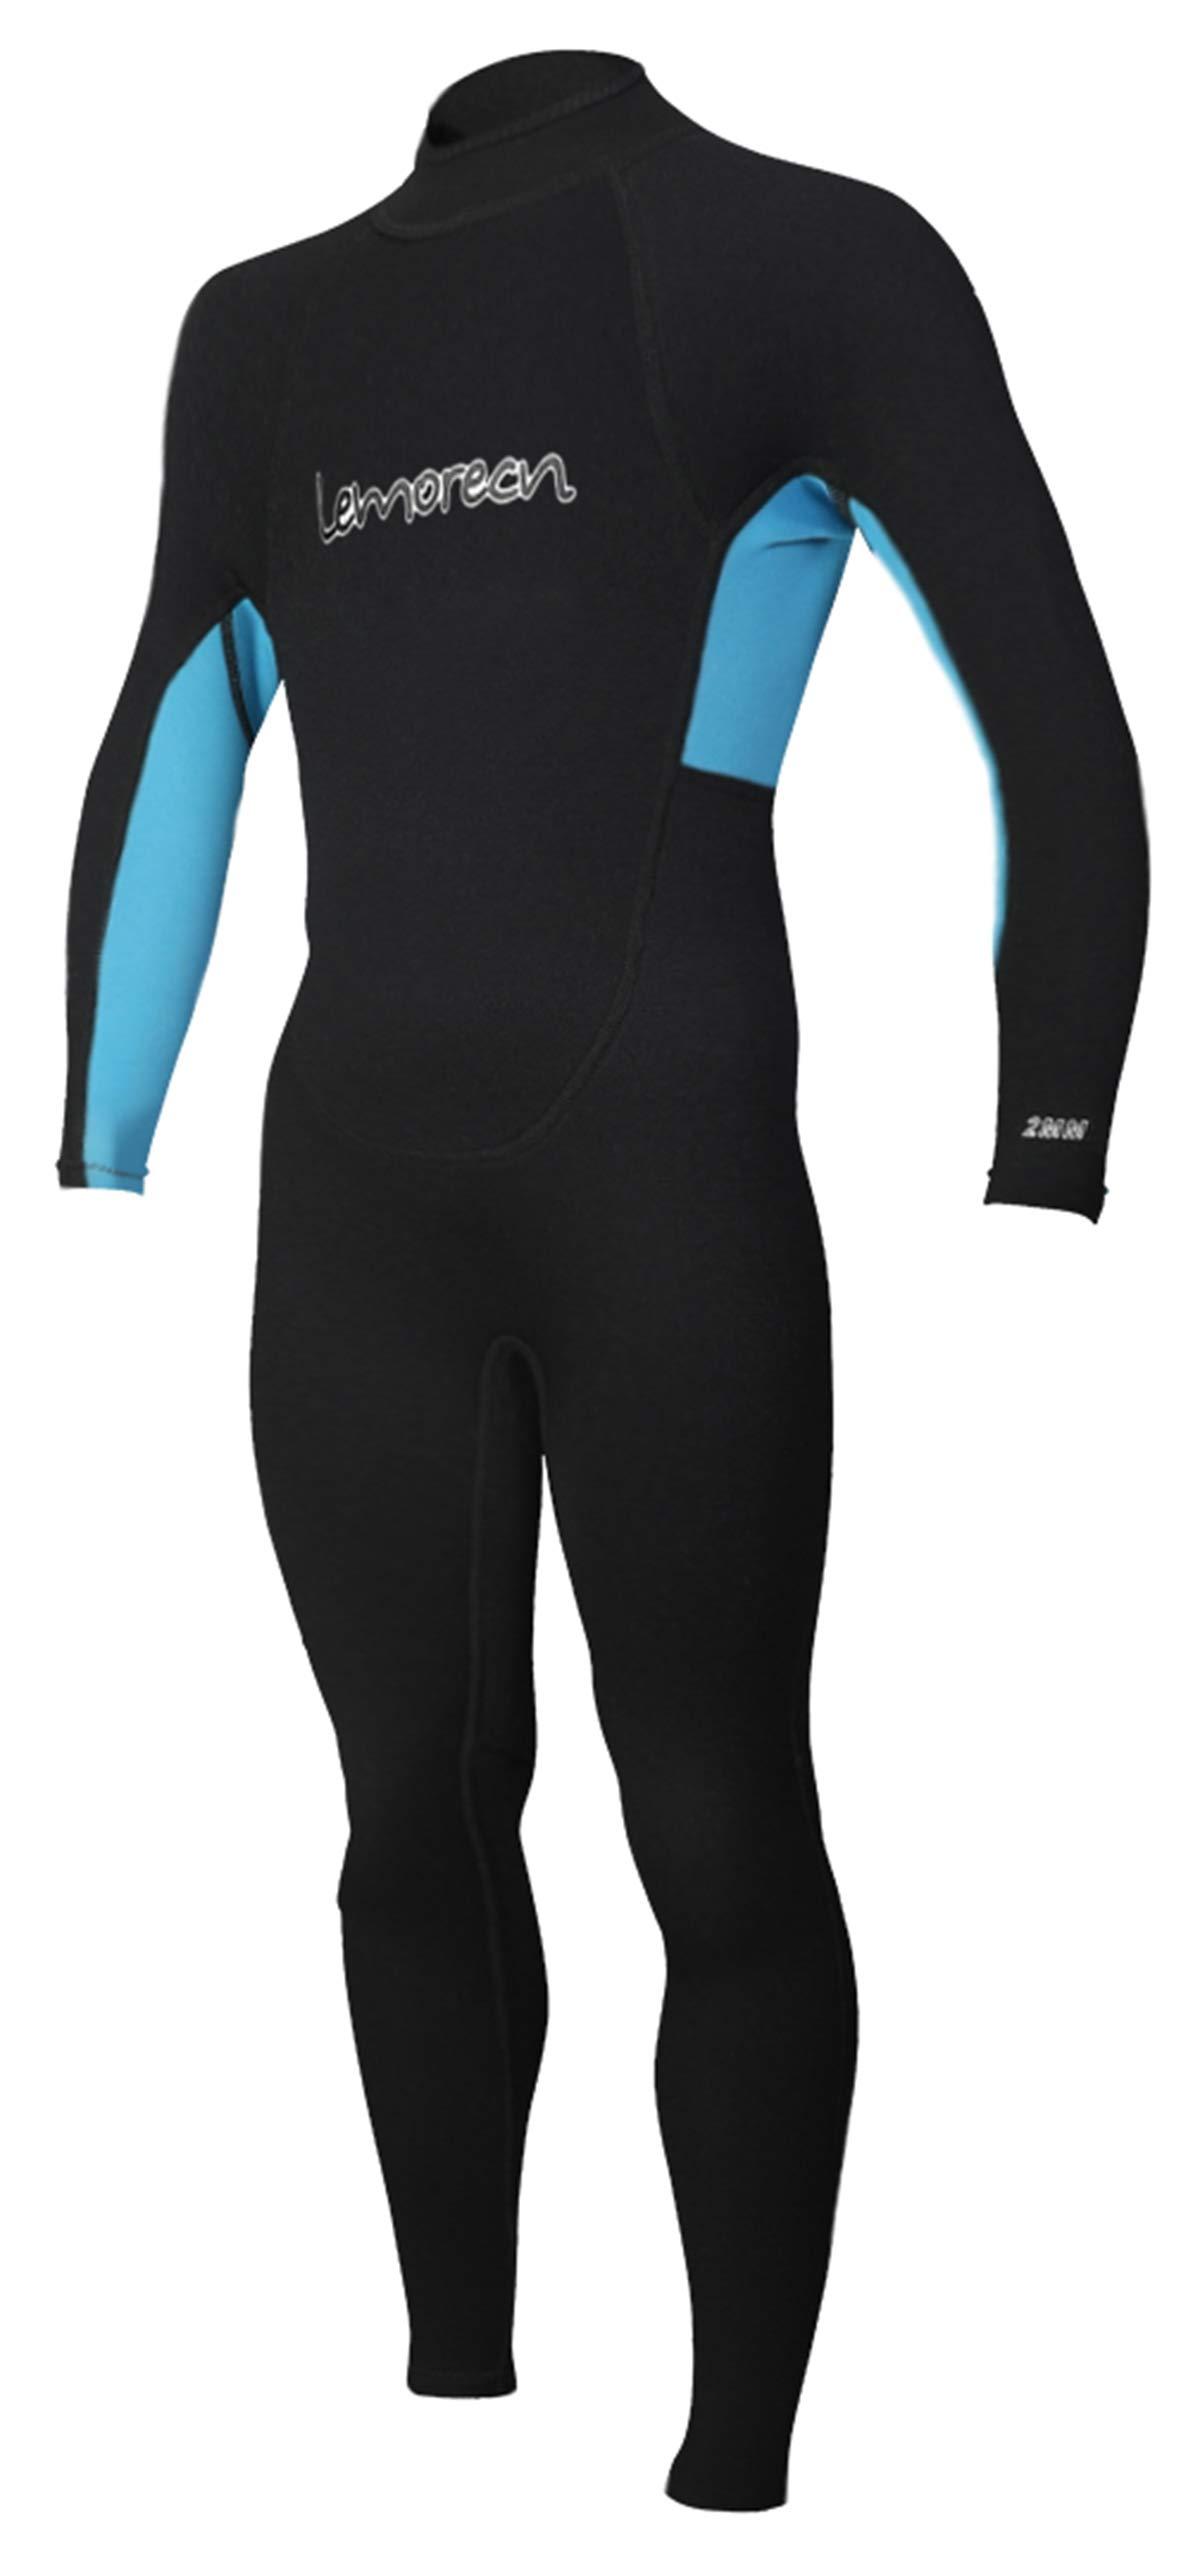 Lemorecn Kids Wetsuits Youth Premium Neoprene 2mm Youth's Shorty Swim Suits (4032blackblue6)